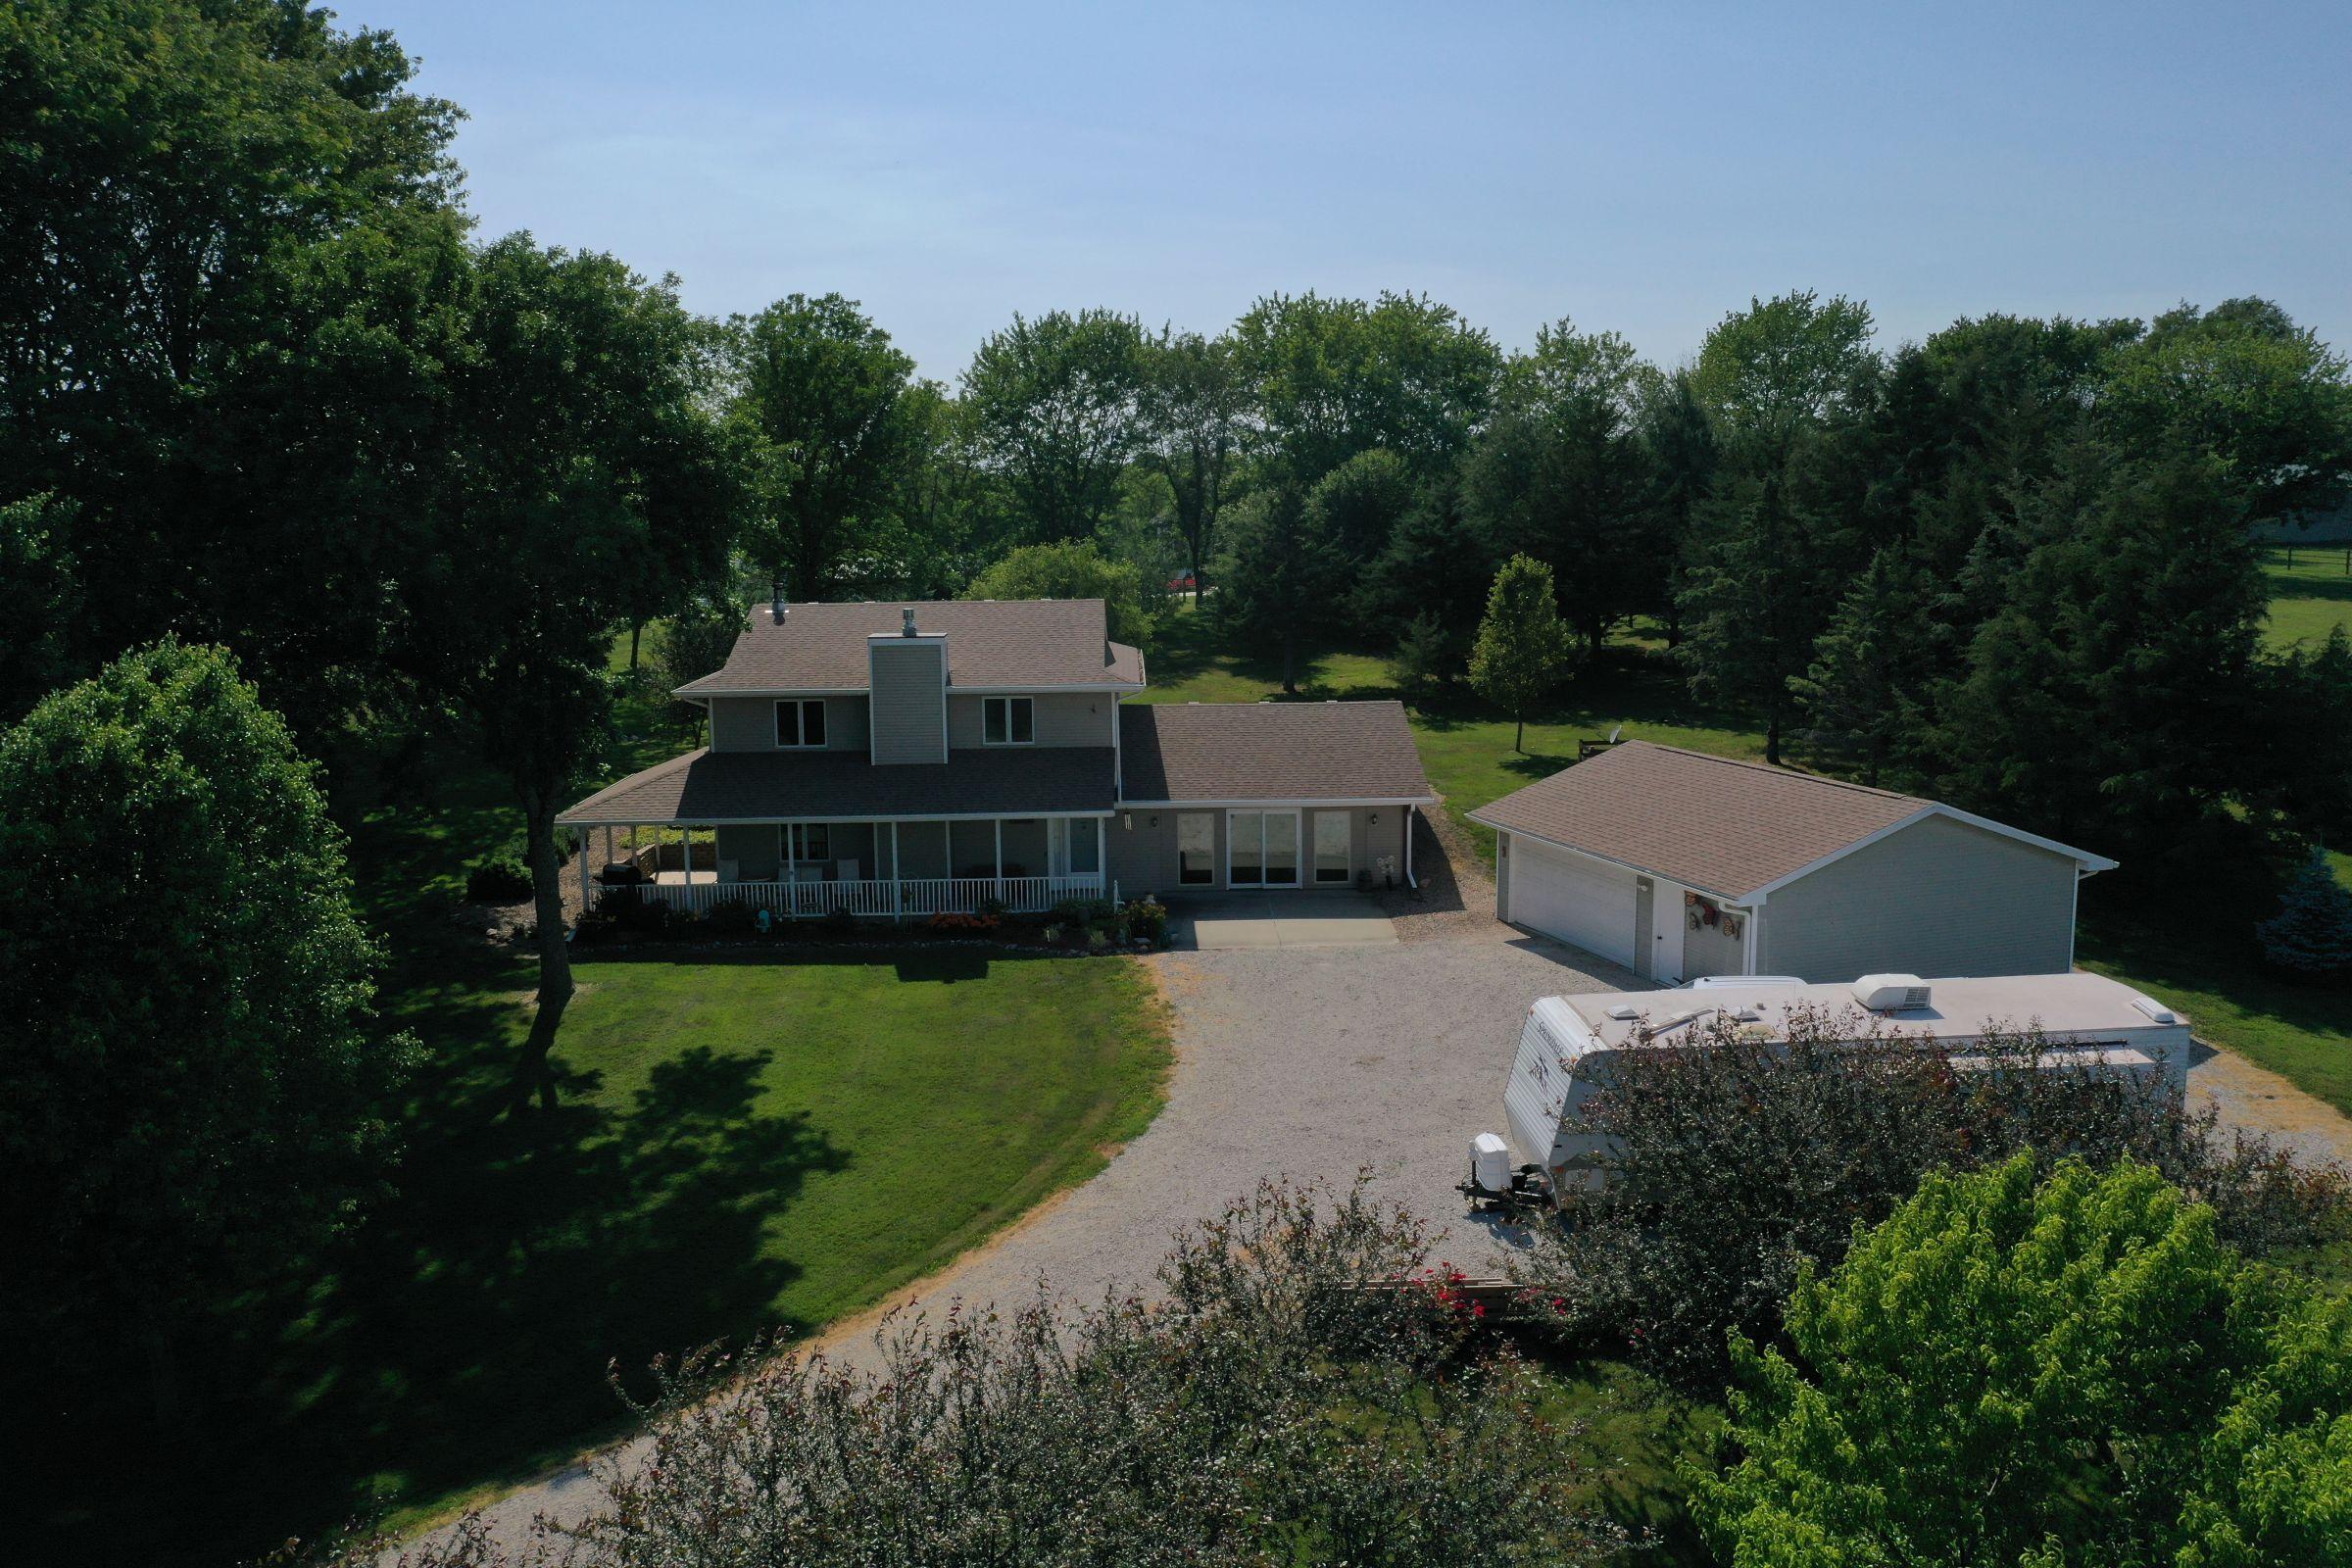 residential-warren-county-iowa-3-acres-listing-number-15593-0-2021-06-18-162717.JPG